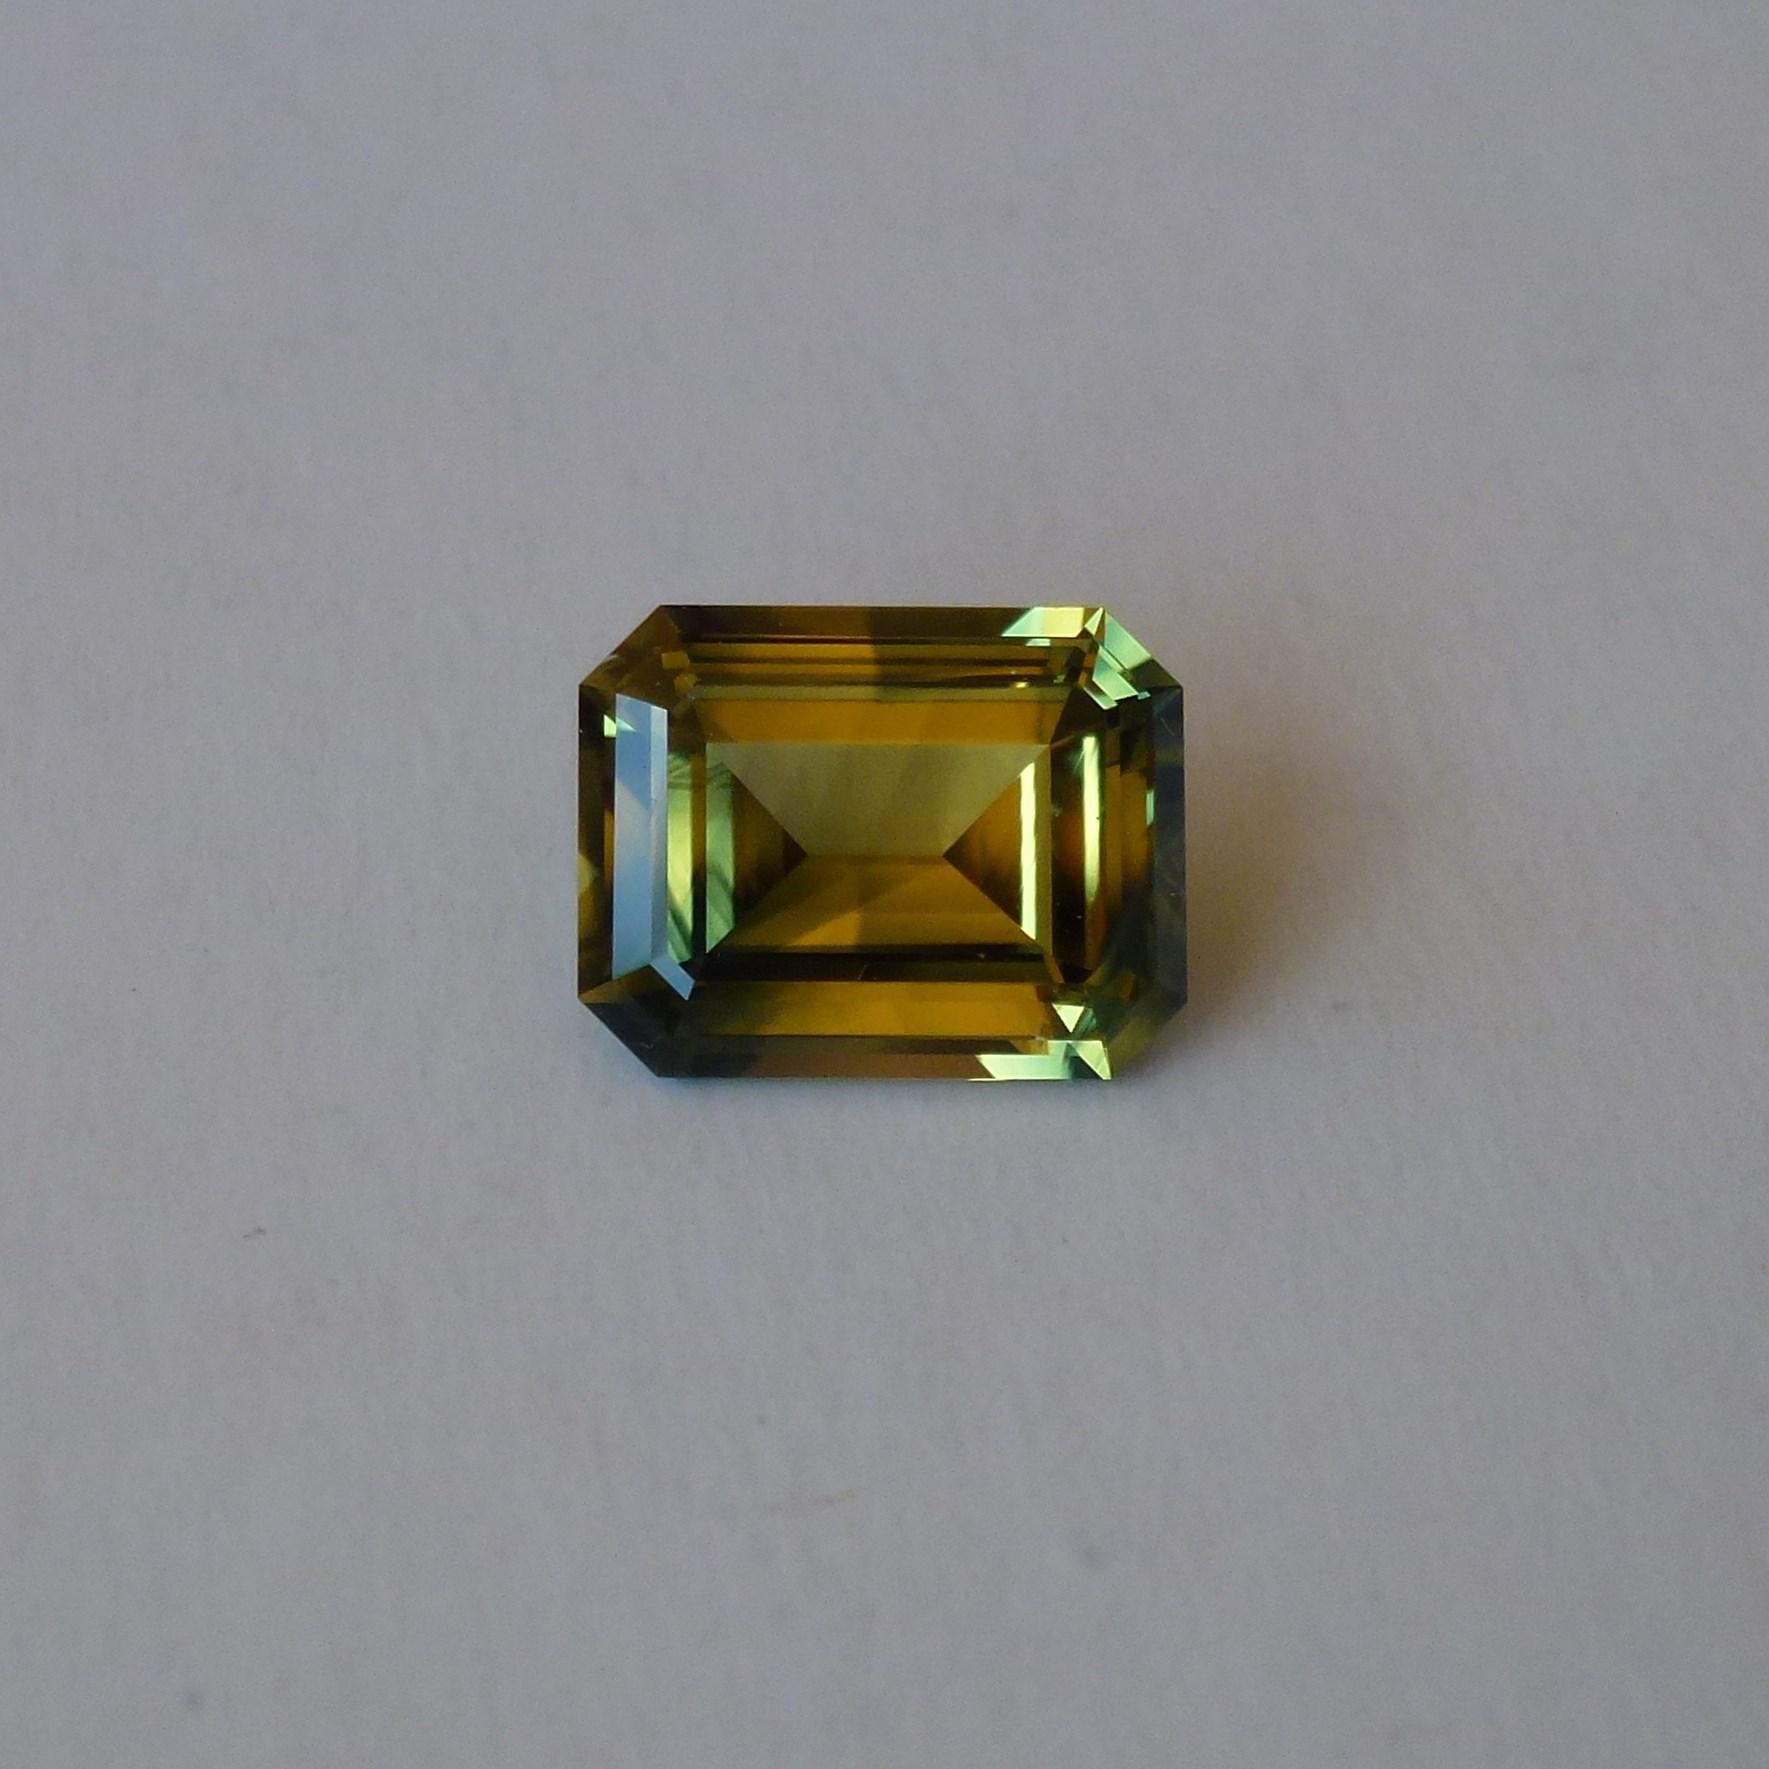 15093 - Yellow Green Parti Sapphire